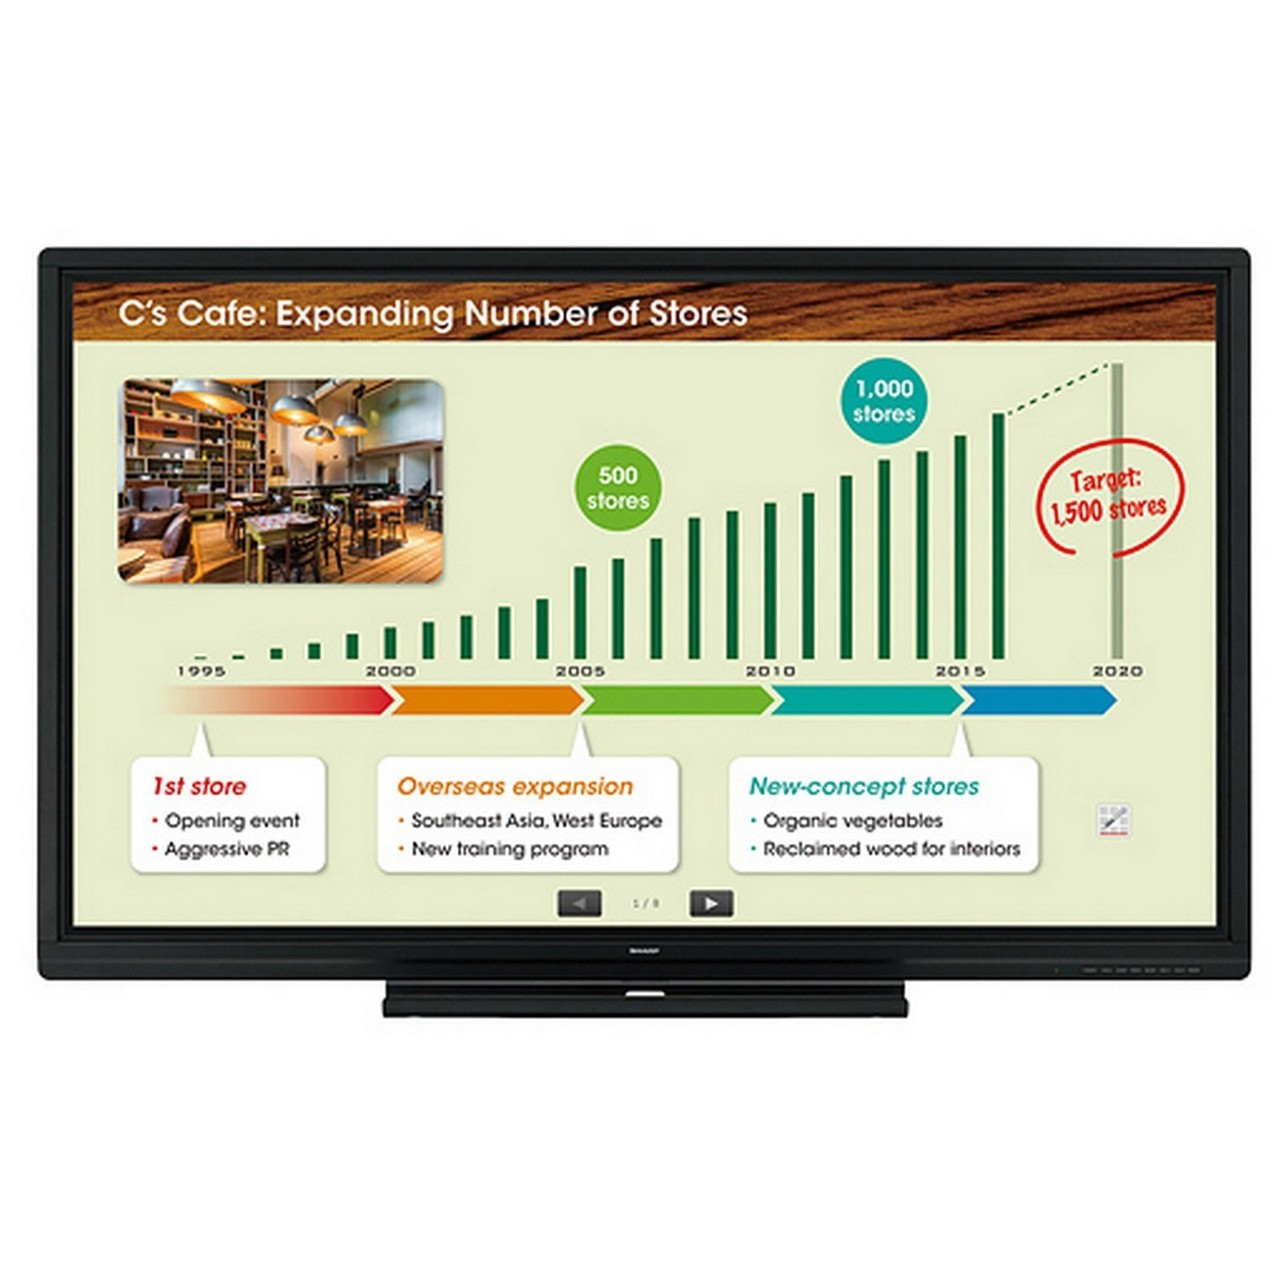 Sharp PNC805B Aquos Board Full-Hd 80In Class Display